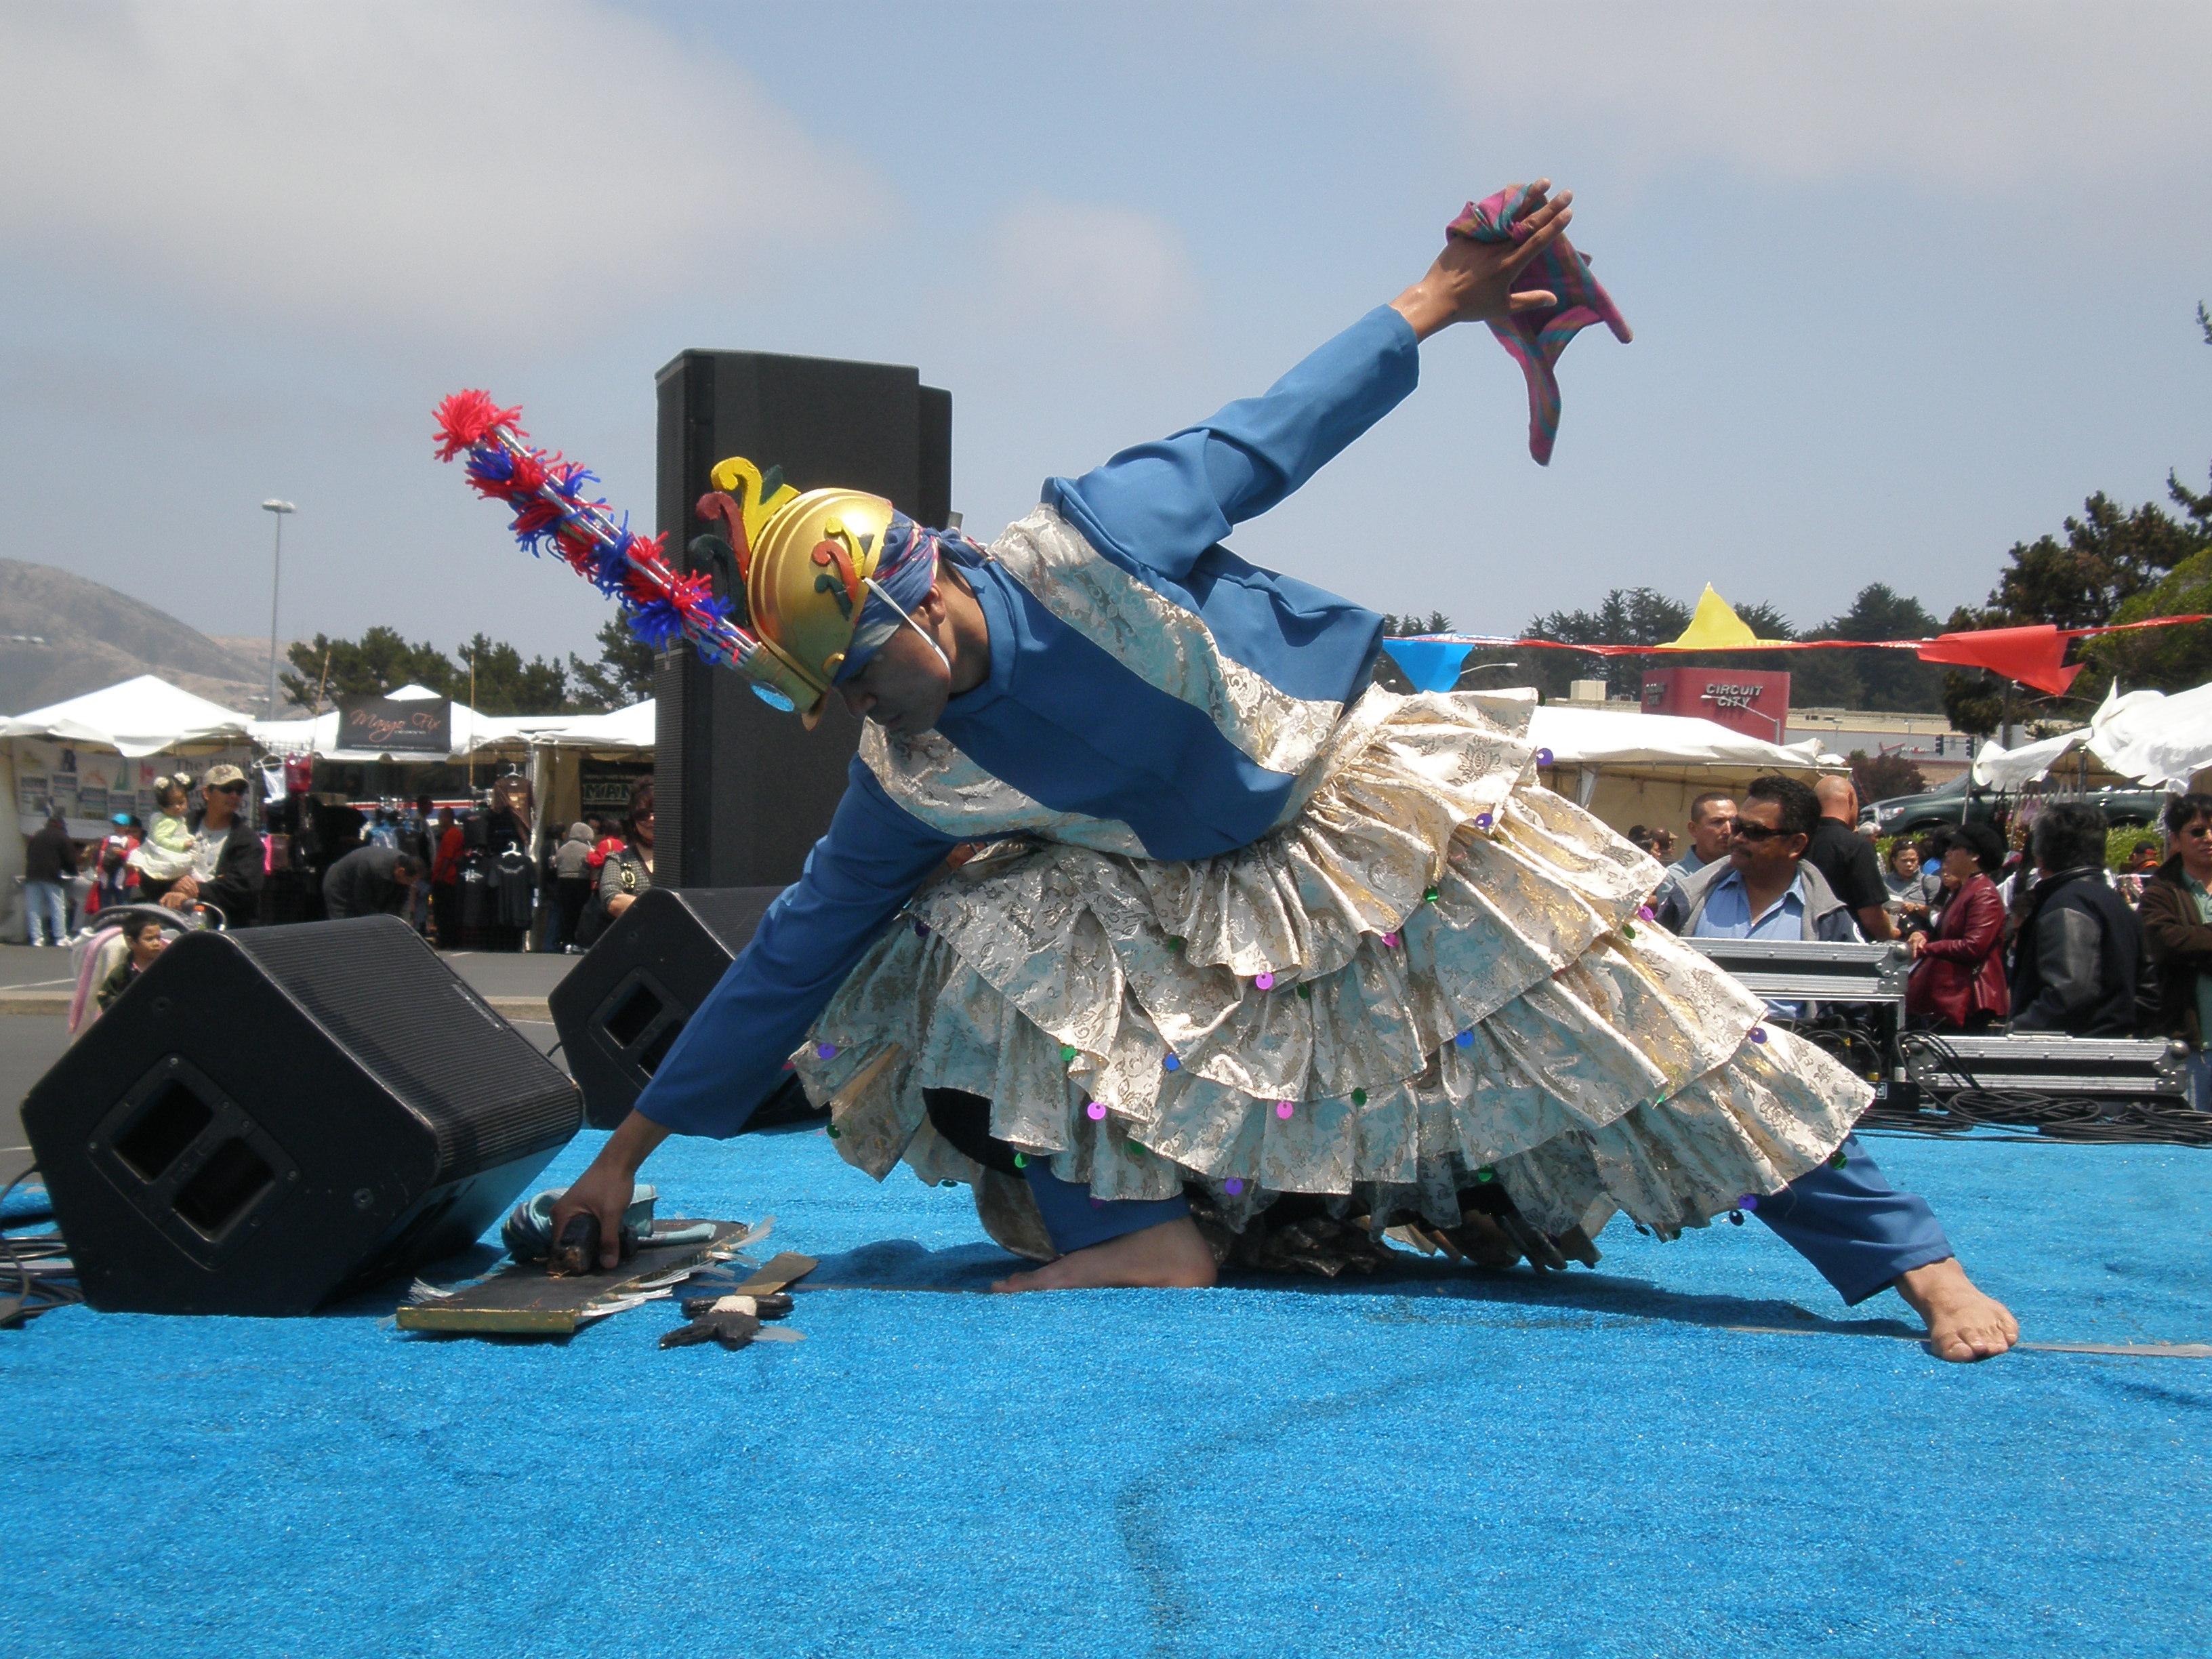 Parangal dance company philippine folk dance - File Parangal Dance Co Performing Sagayan At 14th Af Afc 05 Jpg